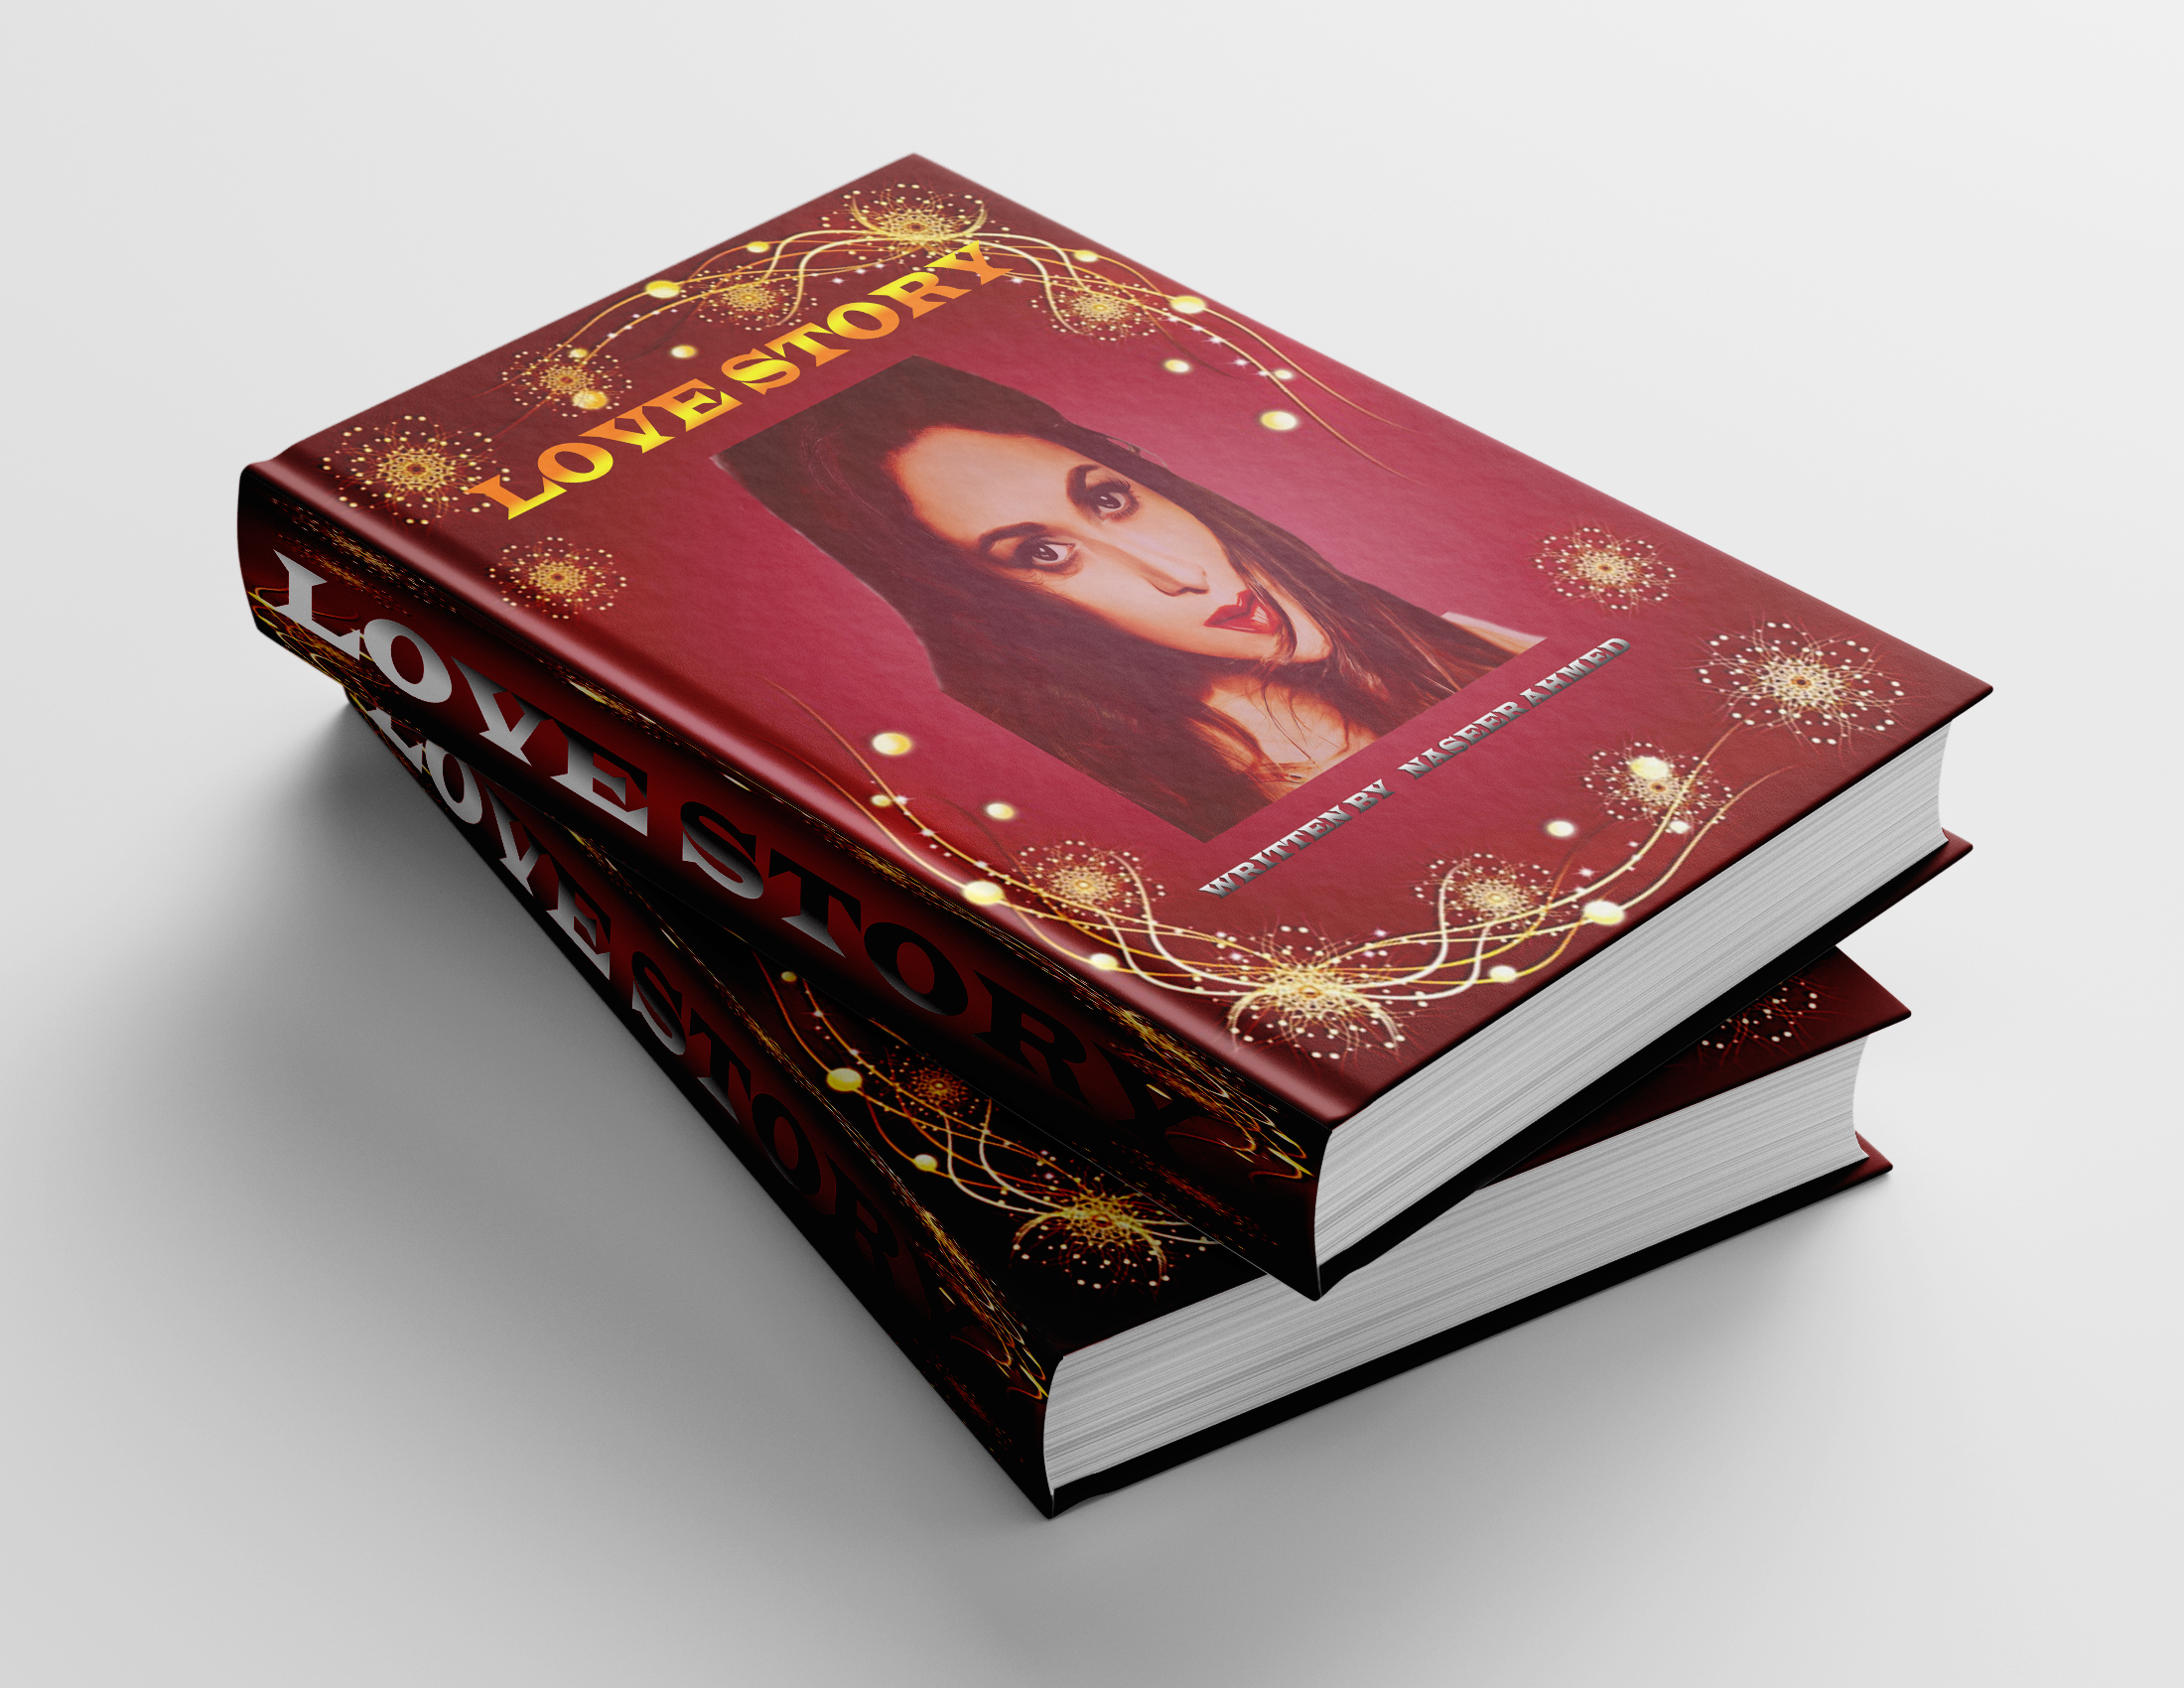 I WILL CREATE A PROFESSIONAL BEAUTIFUL E-BOOK COVER FOR YOU